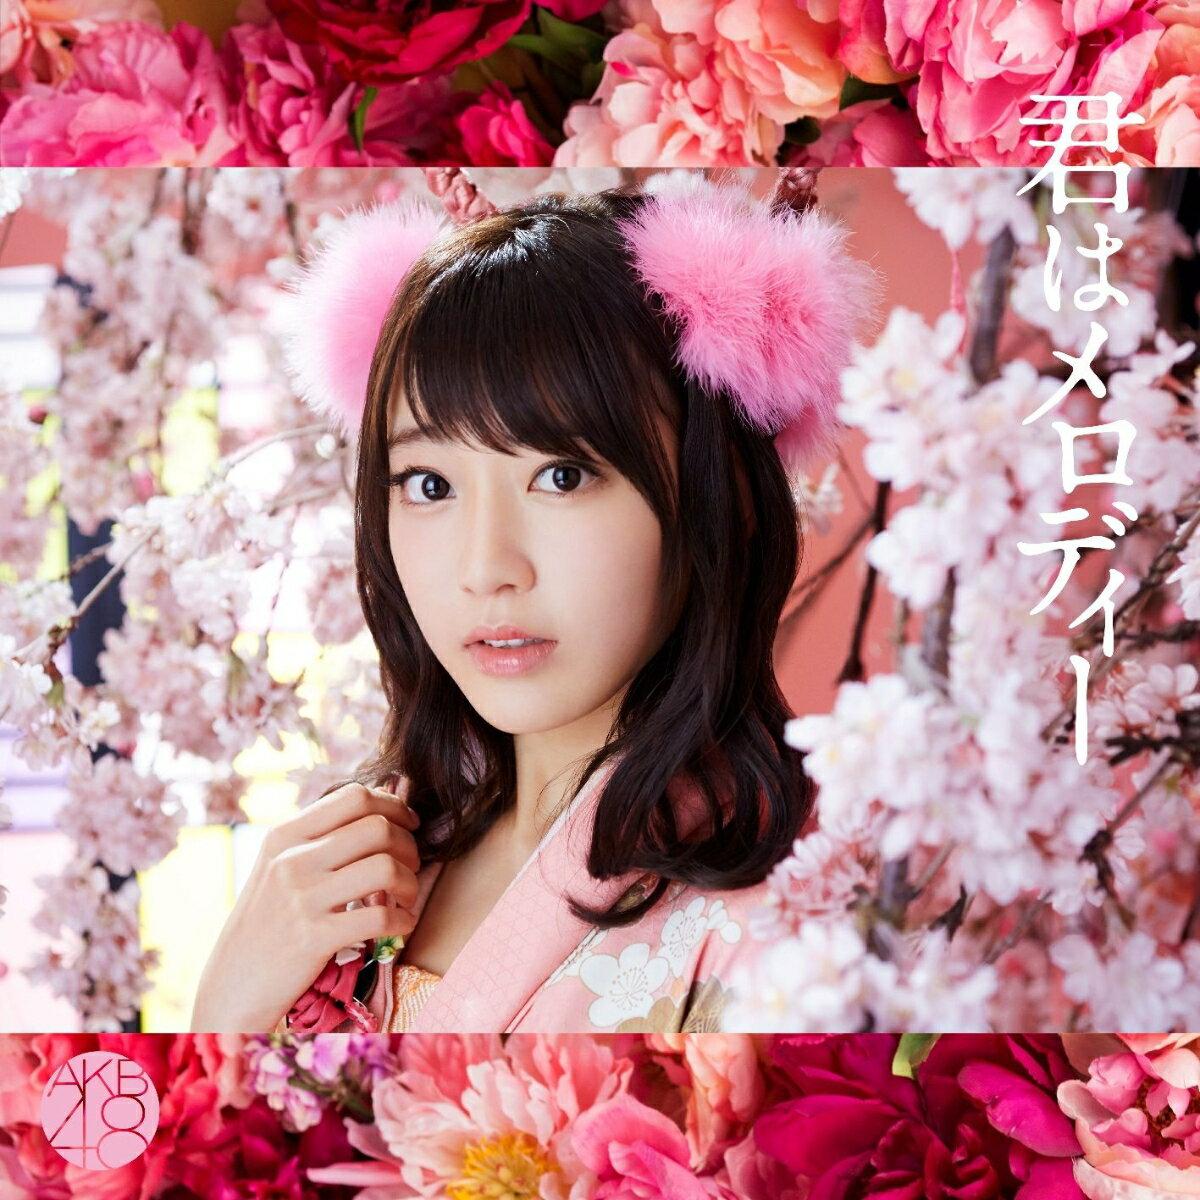 AKB48の最新シングル「君はメロディー」、3月7日〜9日の3日間で売上135万枚 [無断転載禁止]©2ch.netYouTube動画>3本 ->画像>345枚